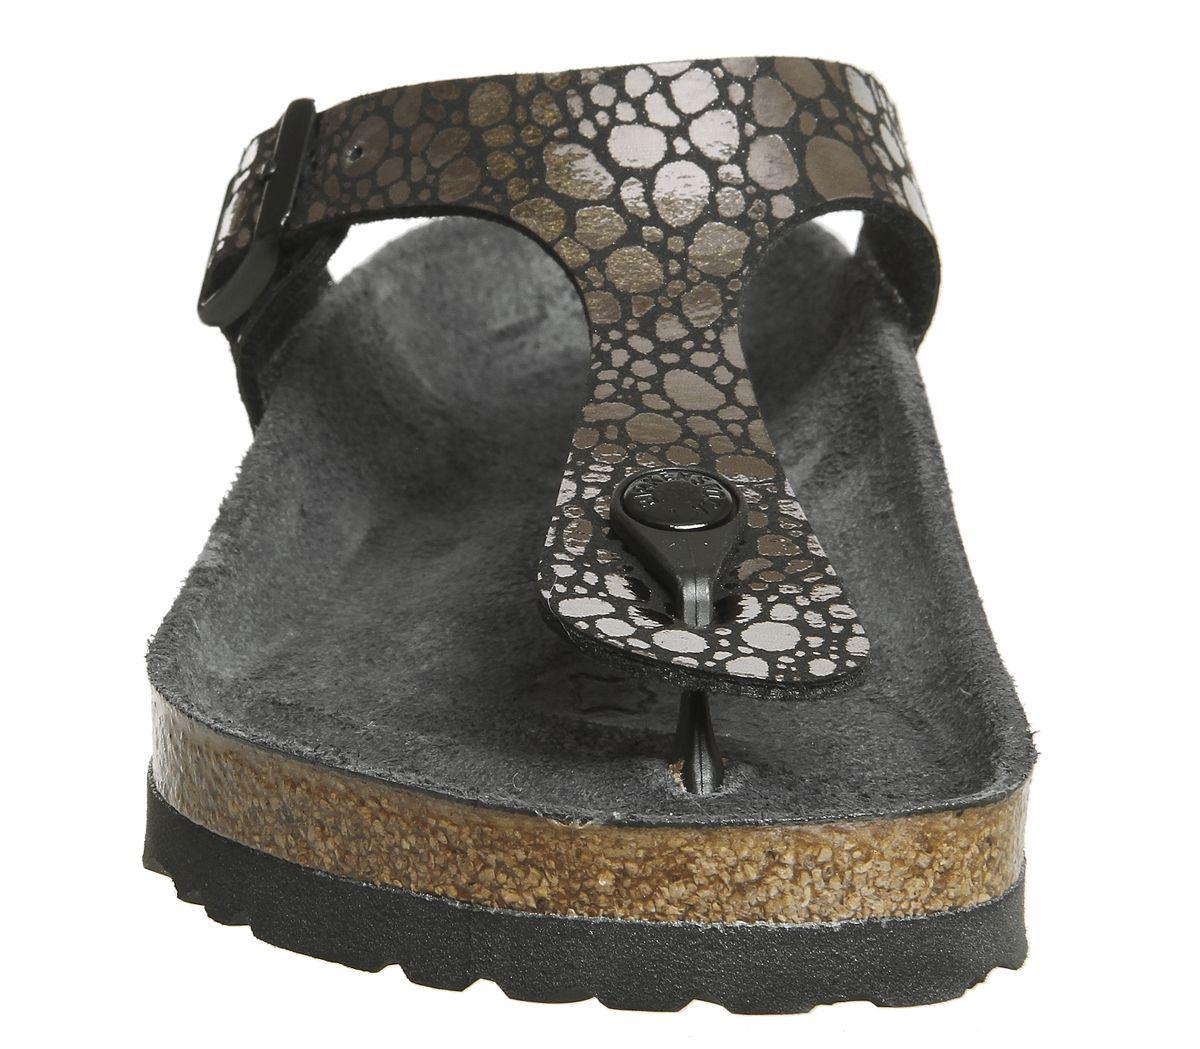 7255d5a62cac Birkenstock Gizeh Toe Thong Sandals Metallic Stones Black Exclusive ...